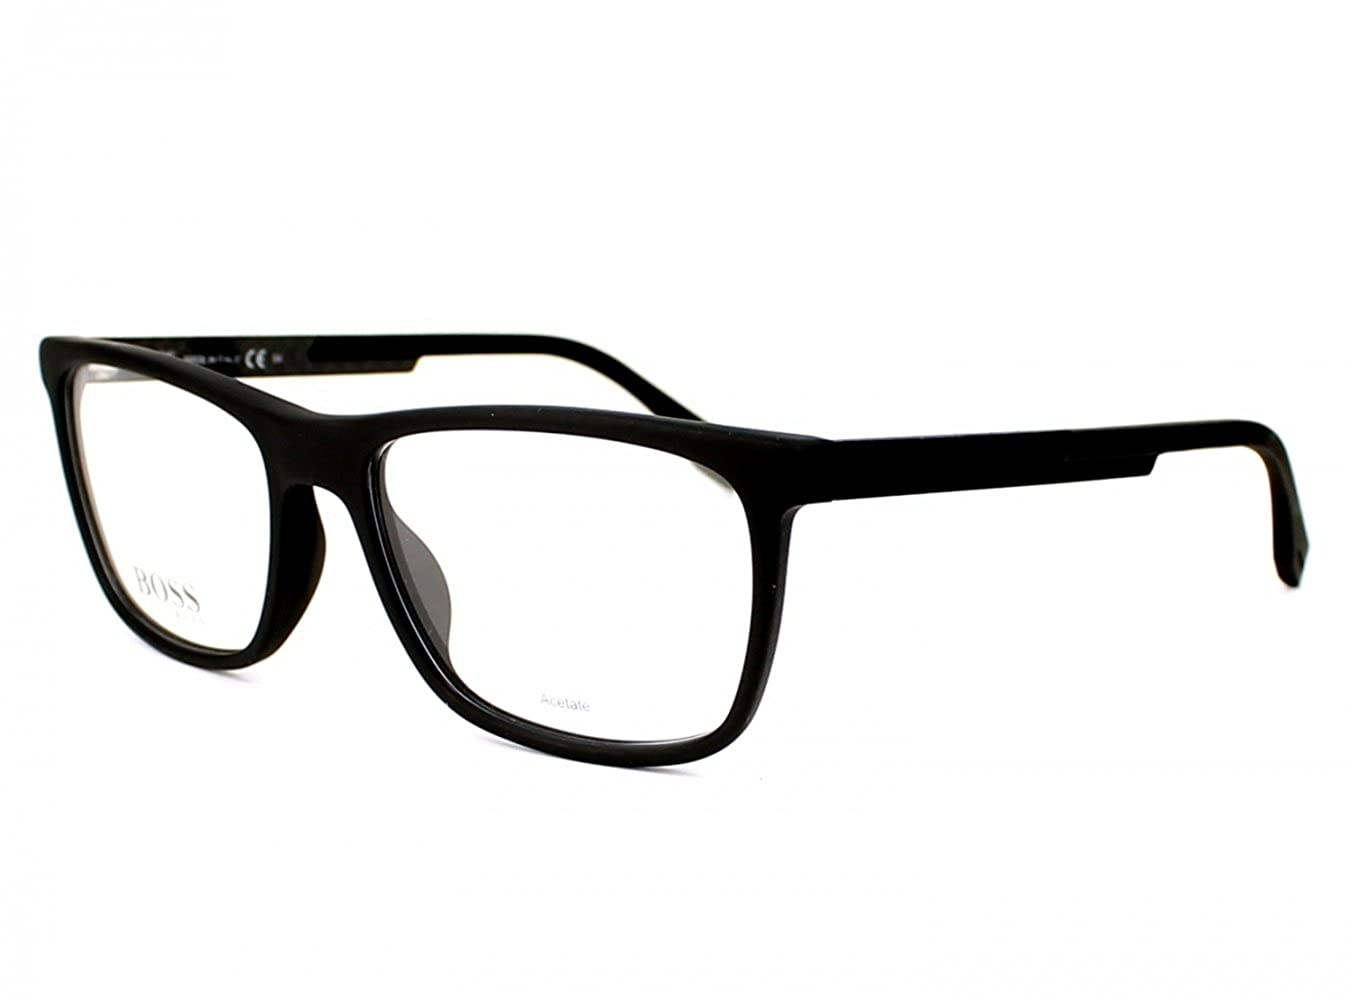 408bdecb7d Amazon.com  Hugo Boss frame (BOSS-0733 KD1) Acetate Matt Black - Carbon   Clothing